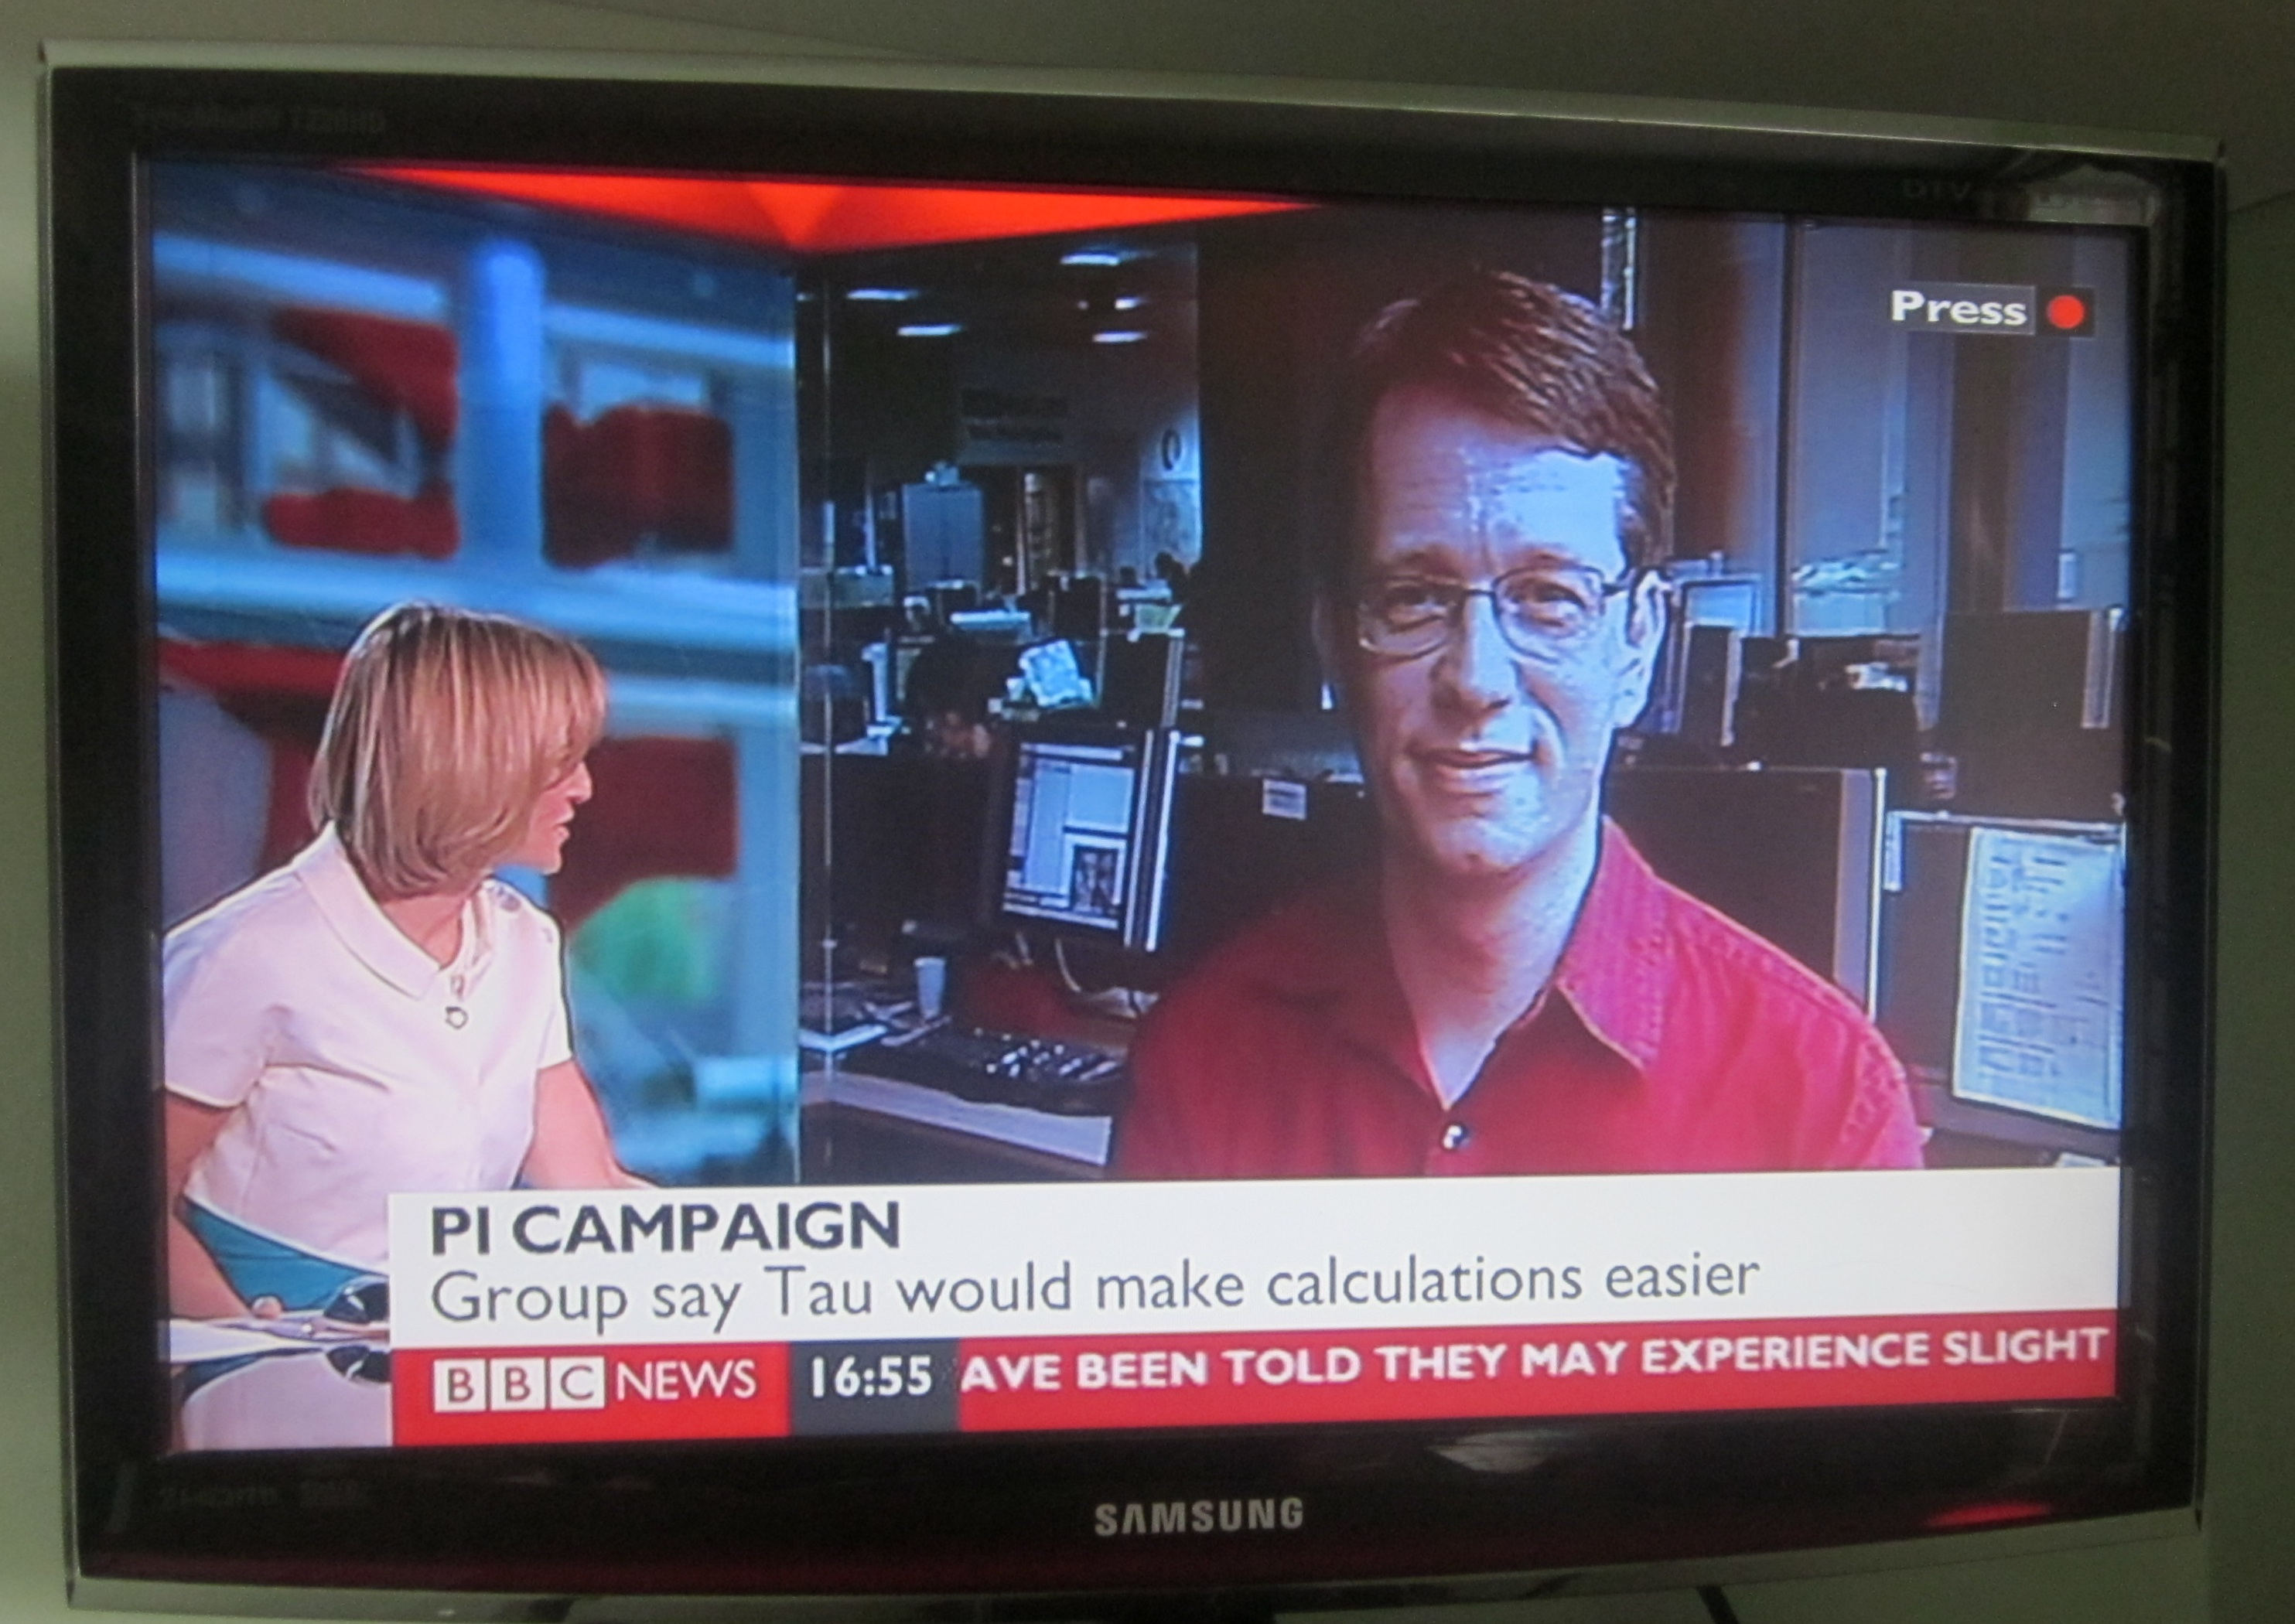 On news video pics 11